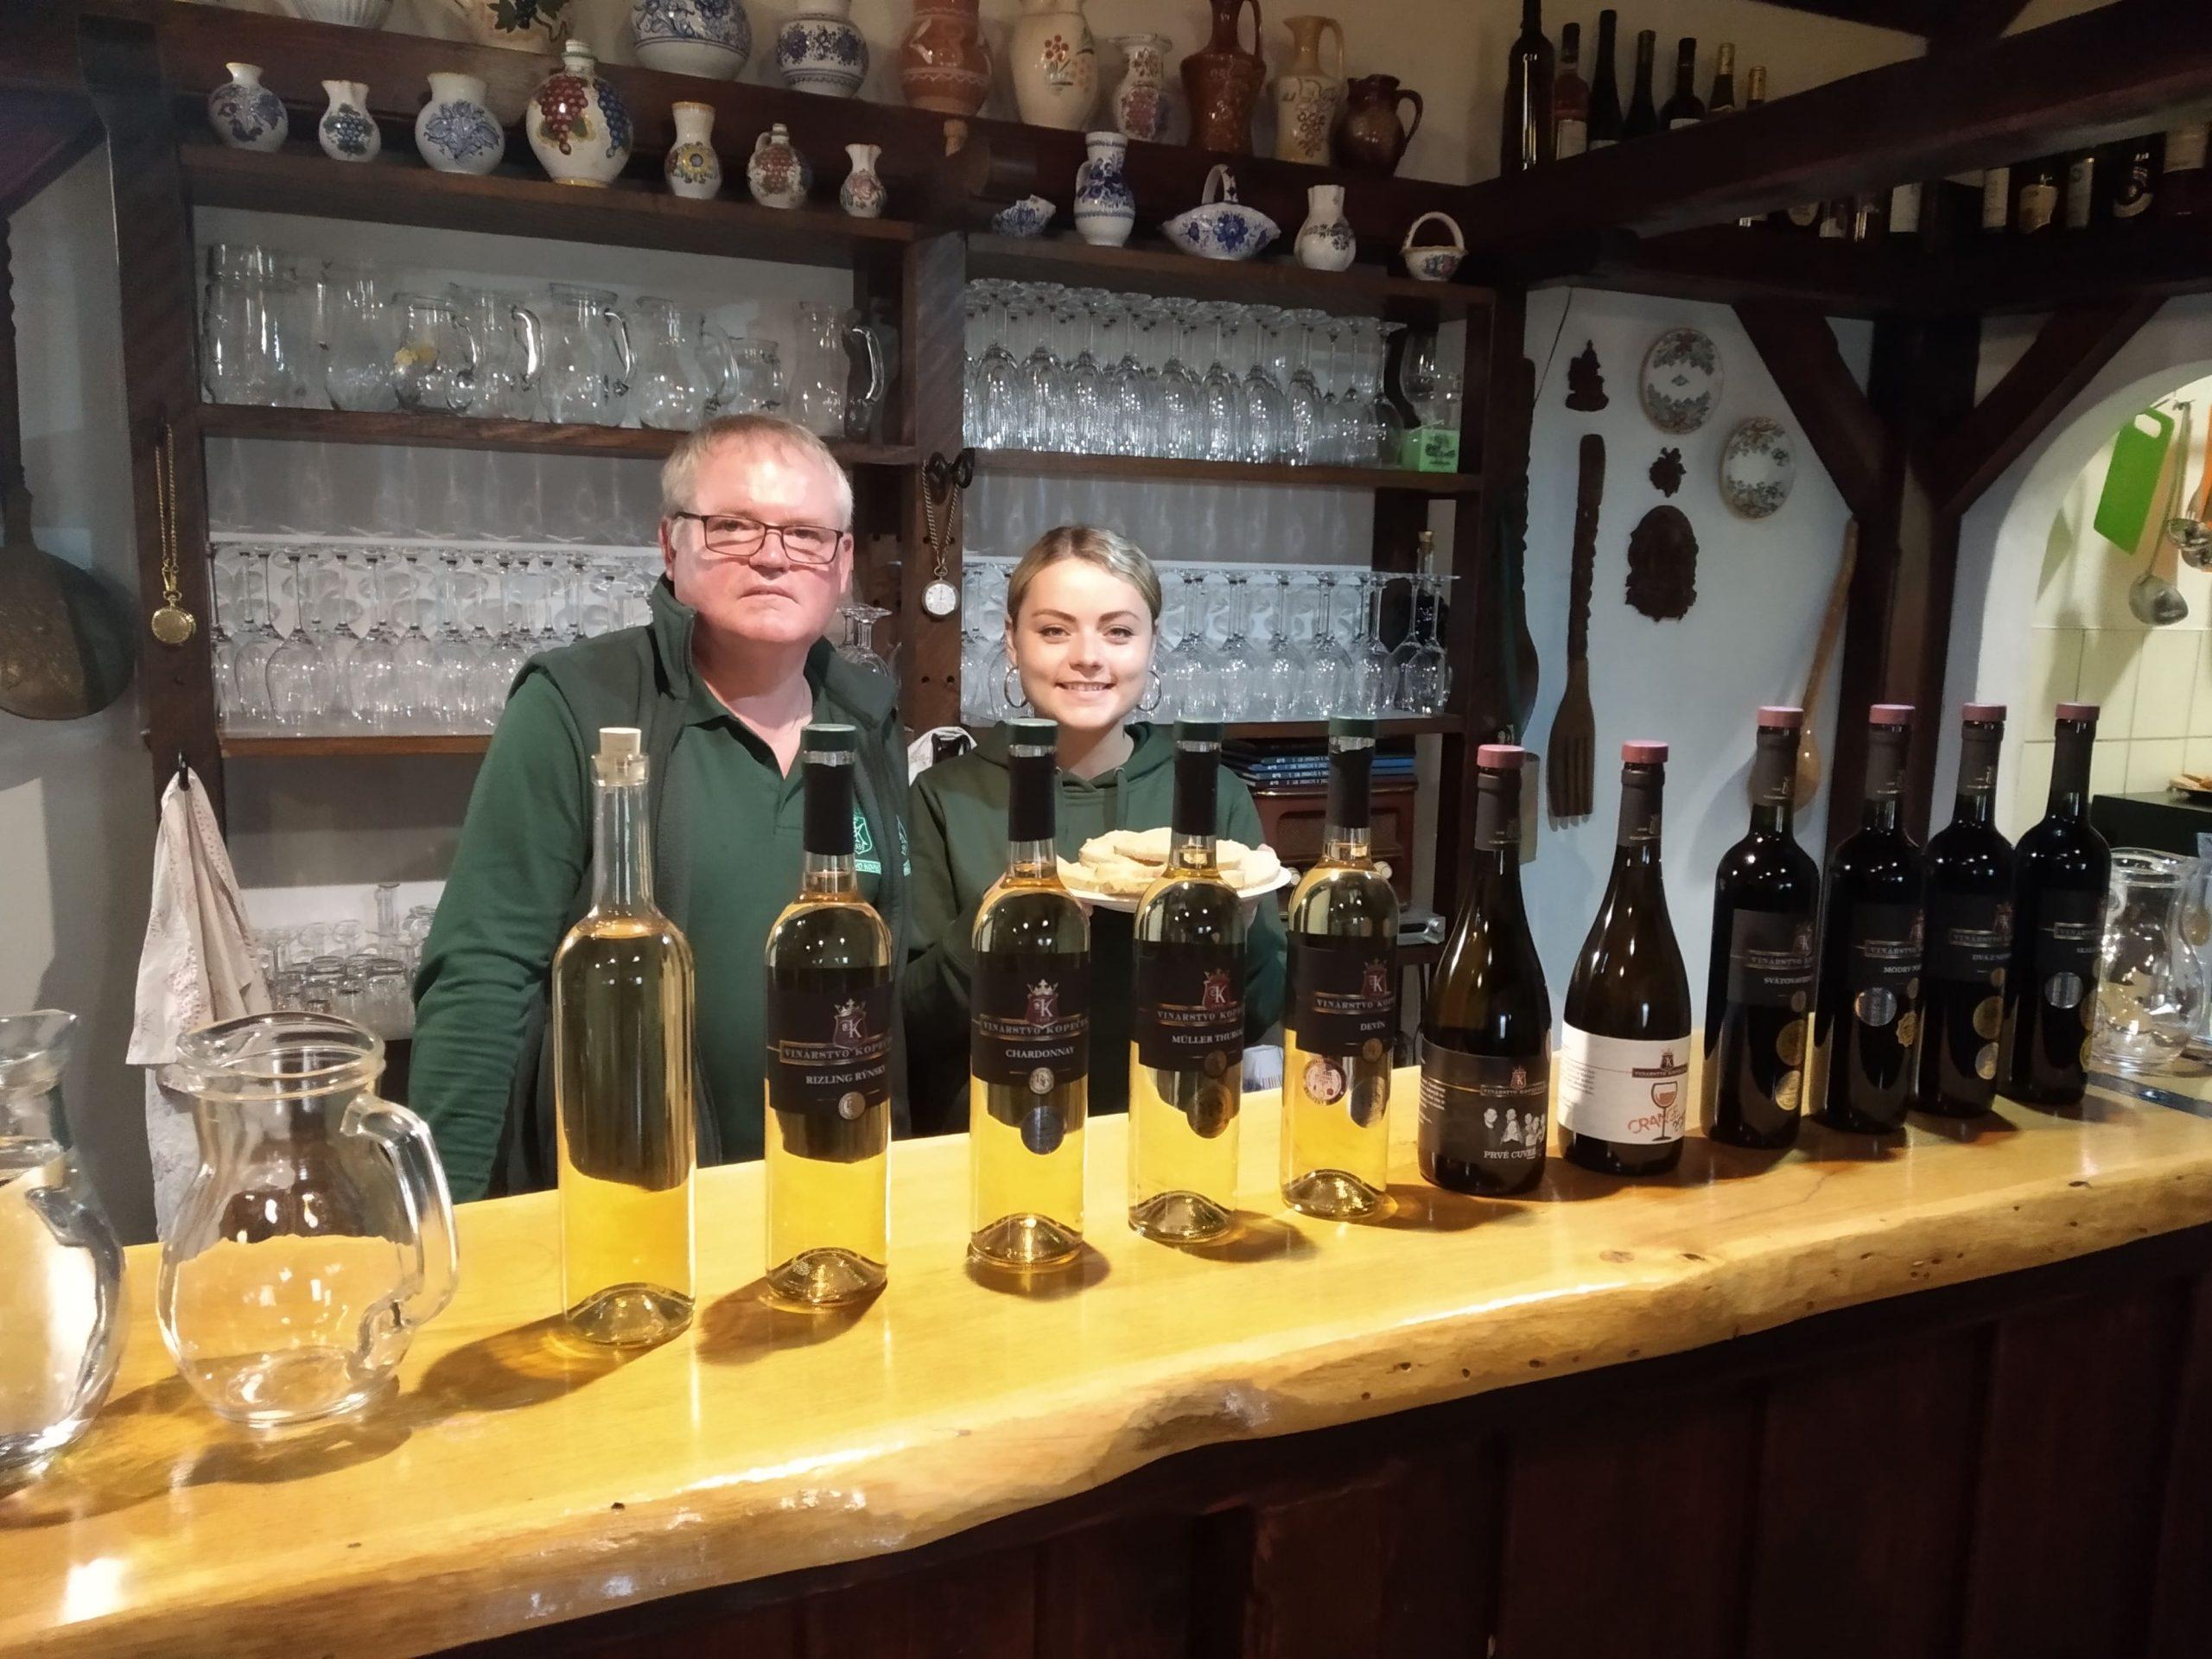 vinarstvo_Vinarstvo Kopecek-min